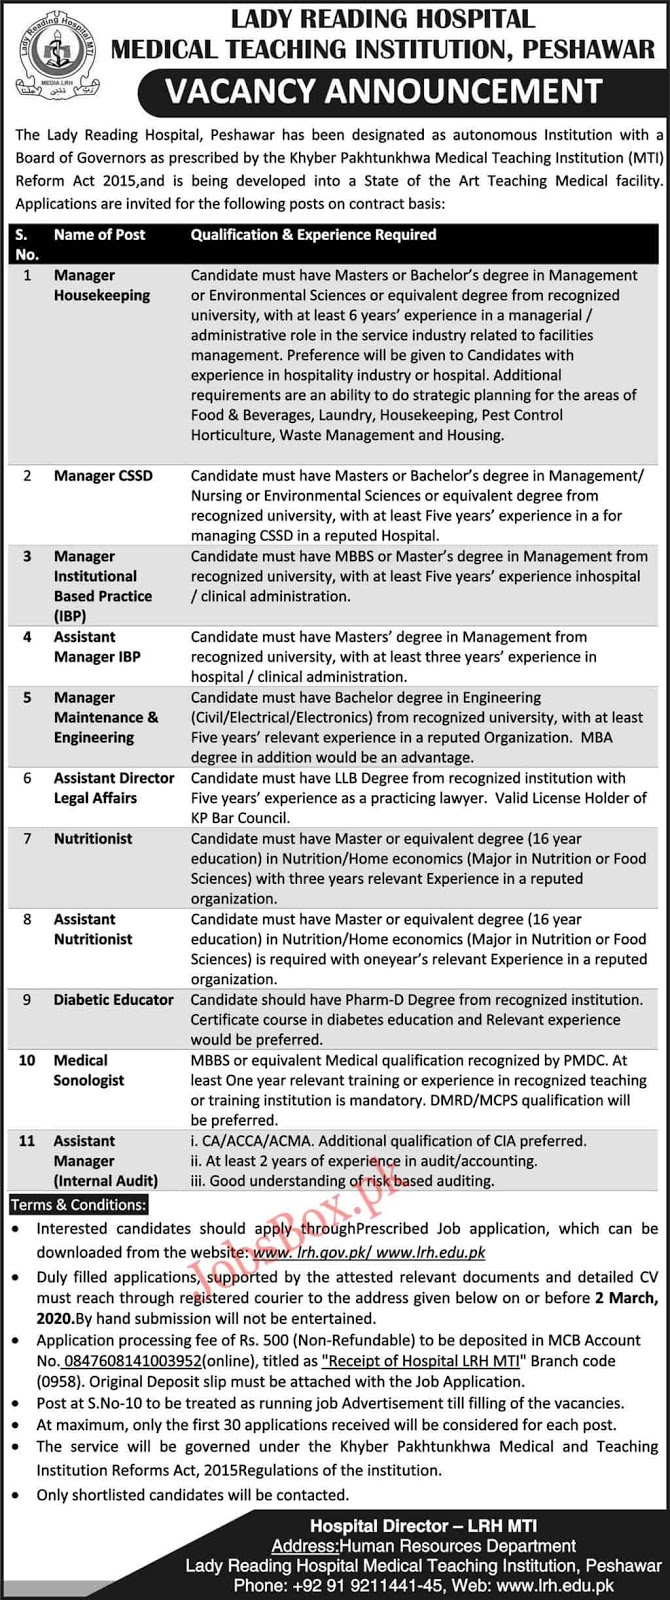 Jobs Lady Reading Hospital LRH Peshwar 2020